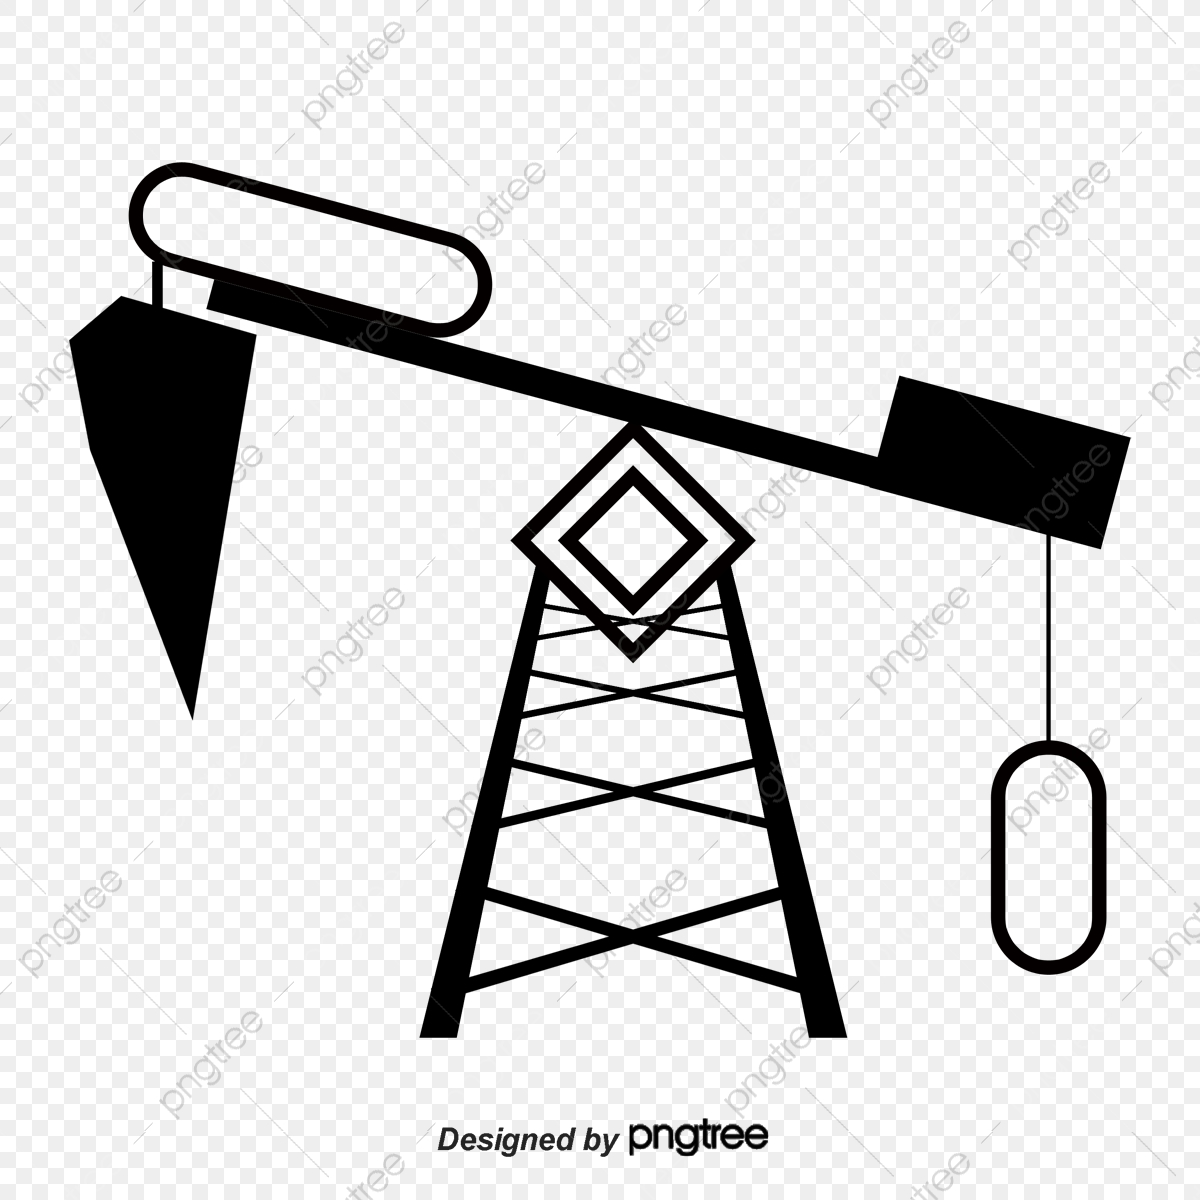 Transparent Drilling Rig Clipart - Cartoon Oil Rig Png, Png Download - vhv